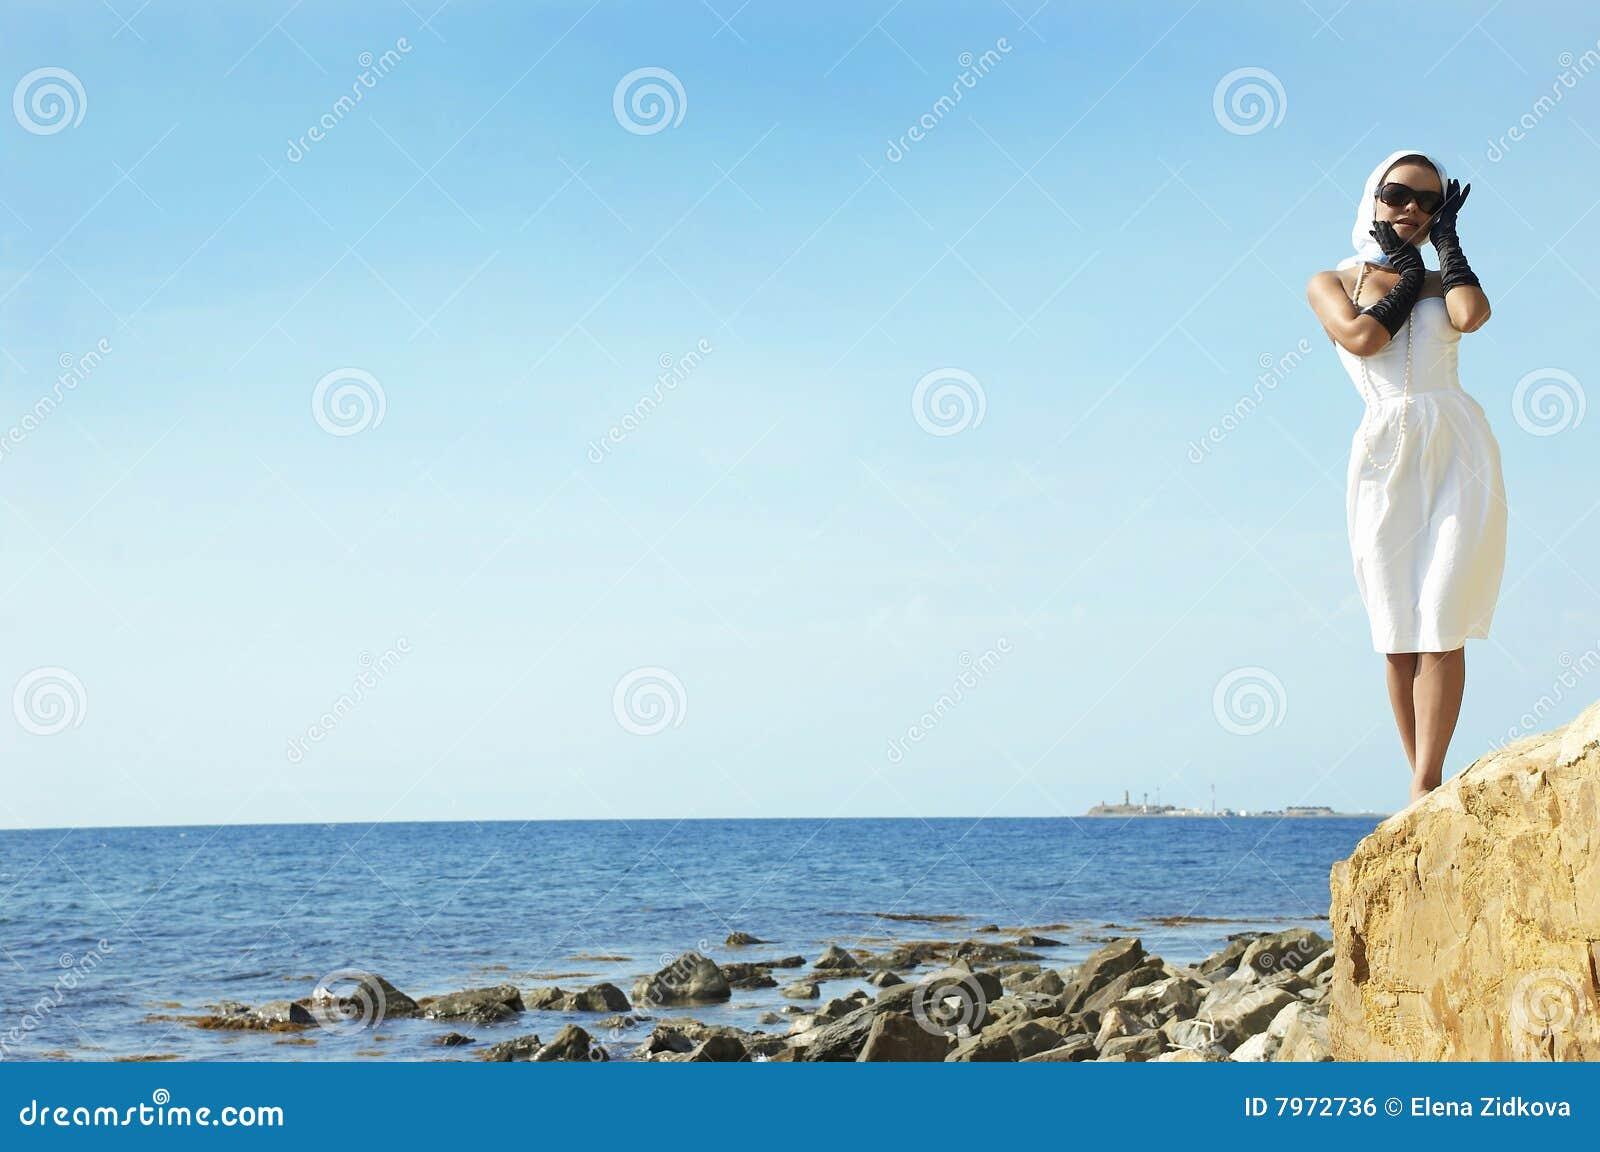 Beautiful woman on a sea beach in black gloves